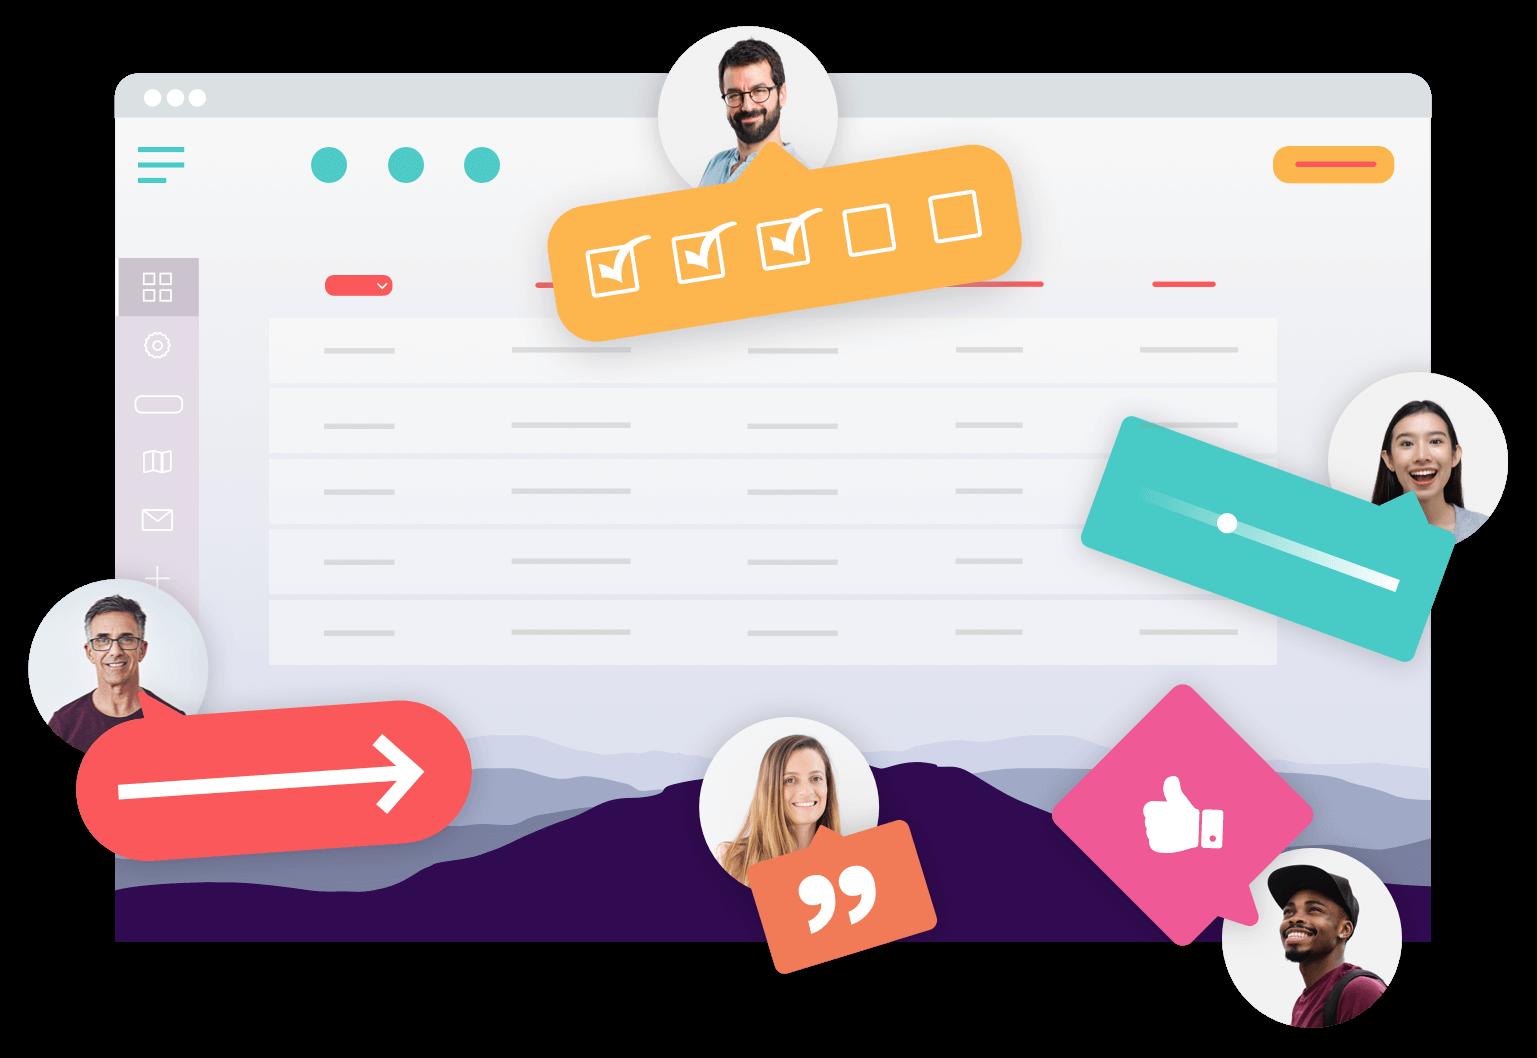 a team contributing to improve a web application through user feedback